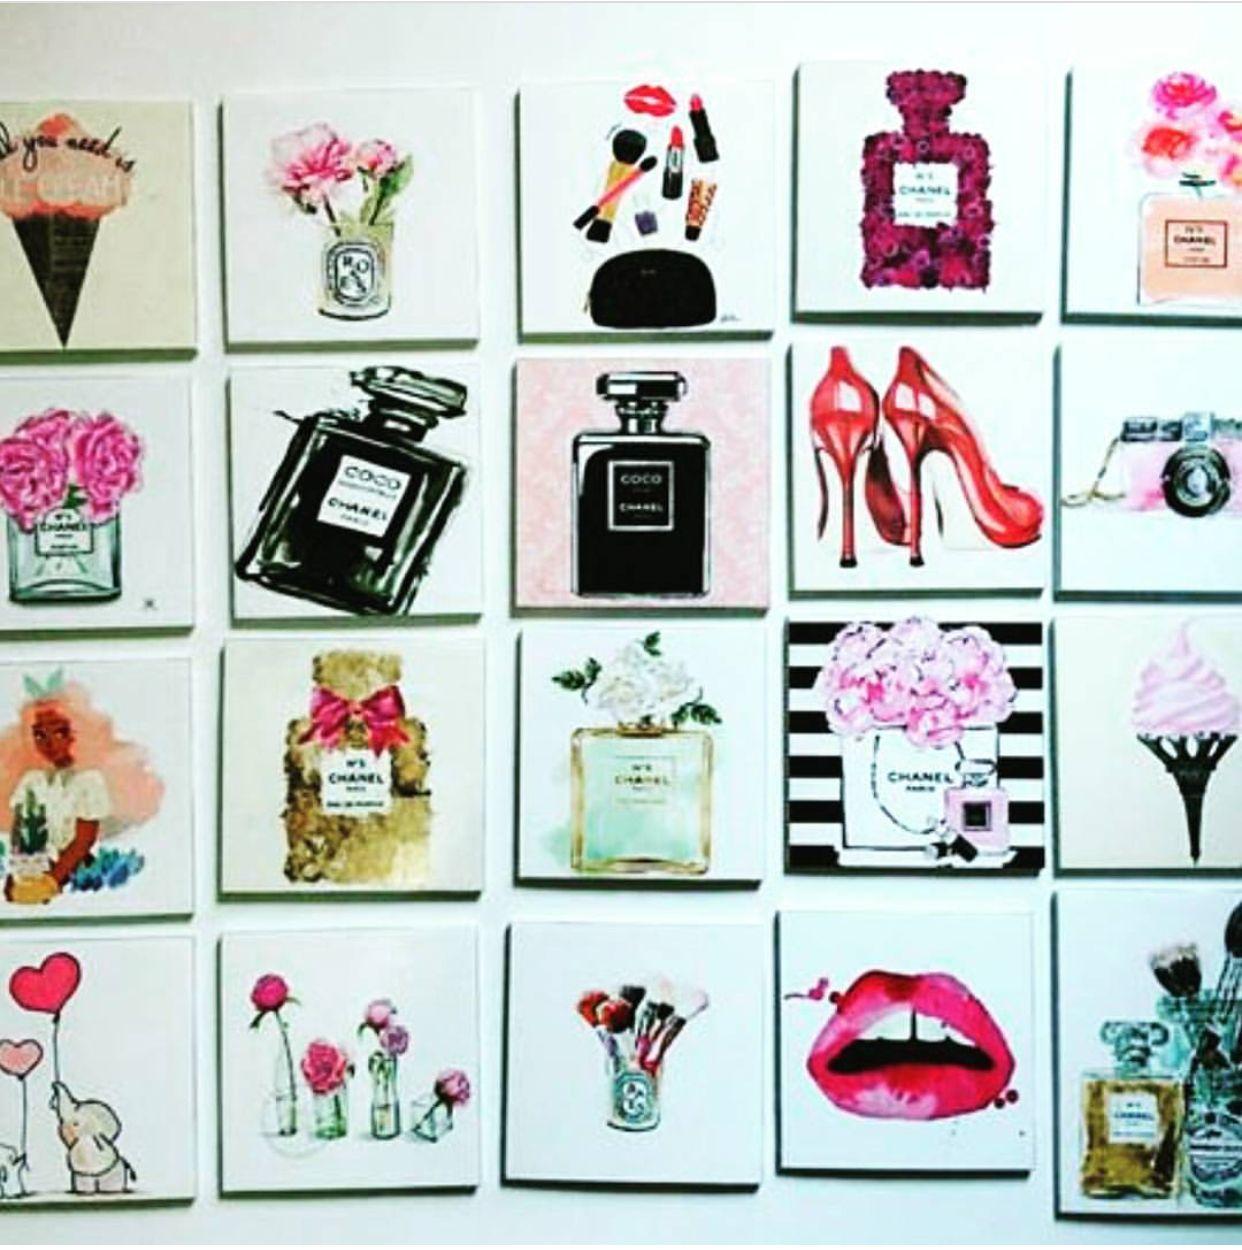 لوحات فلين Calligraphy Art Art Cards